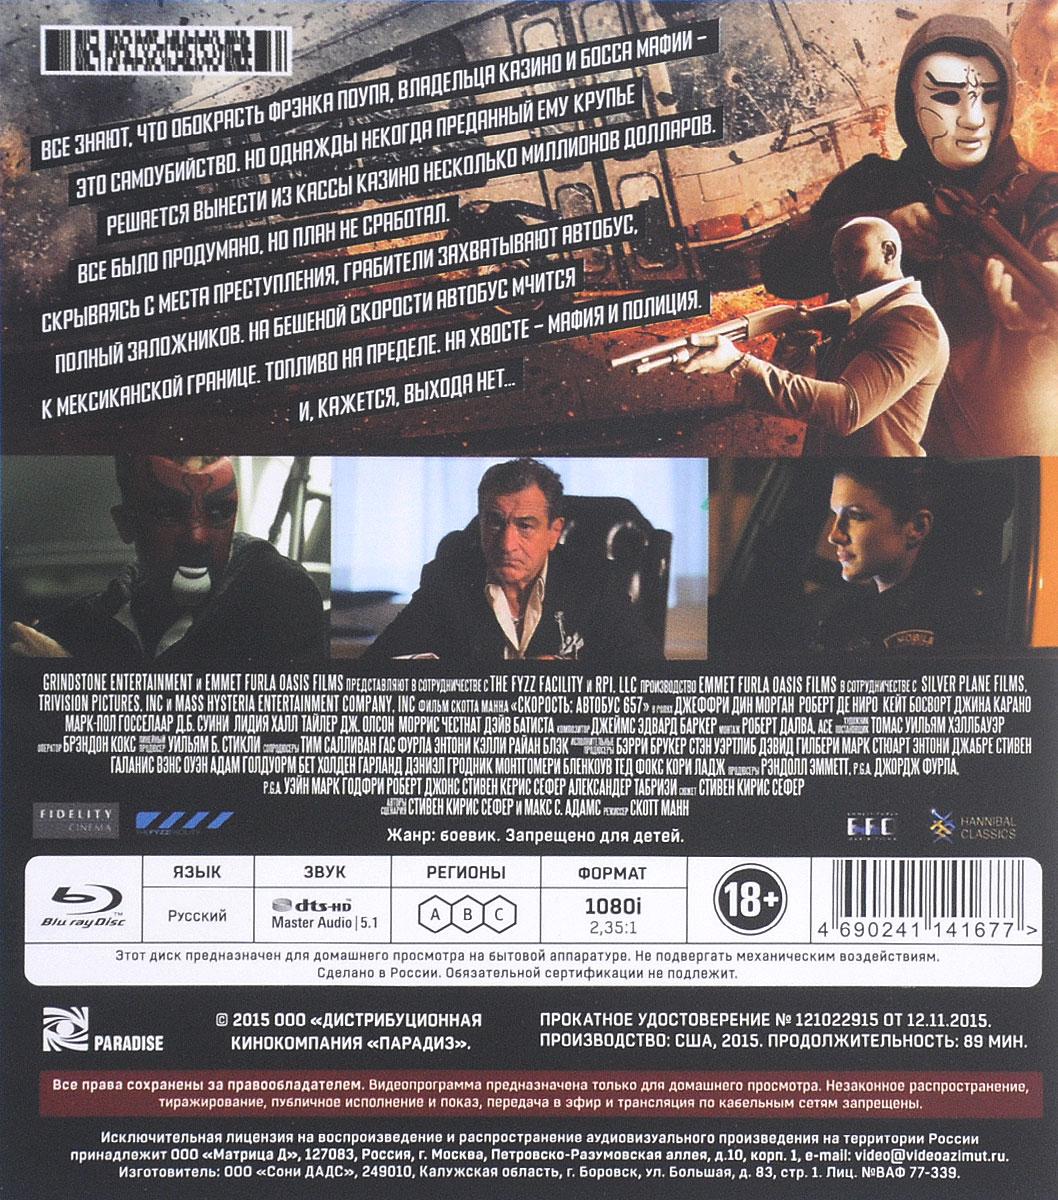 Скорость:  Автобус 657 (Blu-ray) Emmett/Furla Films,Mass Hysteria Entertainment,Randall Emmett / George Furla Productions